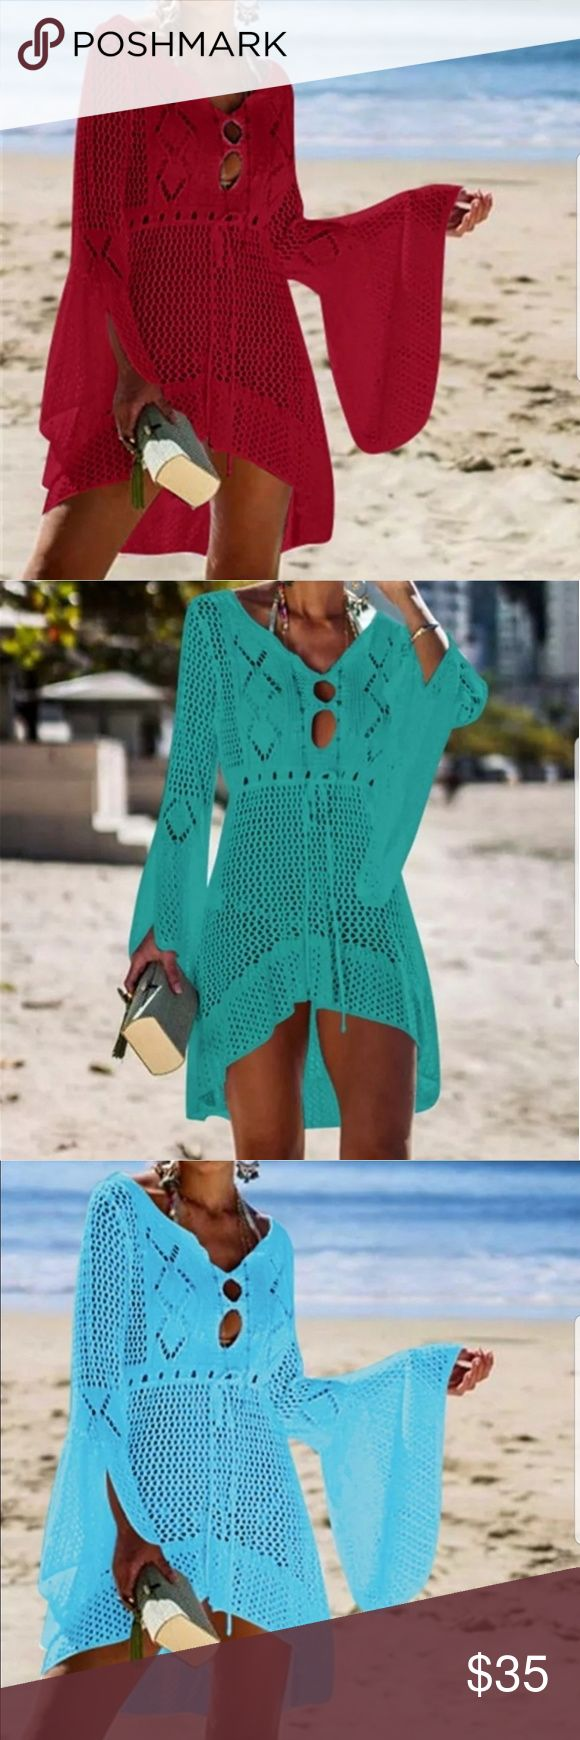 High Quality Crochet Knitted Beach Dress Red Summer Women Beachwear Sexy Red Cro... 3